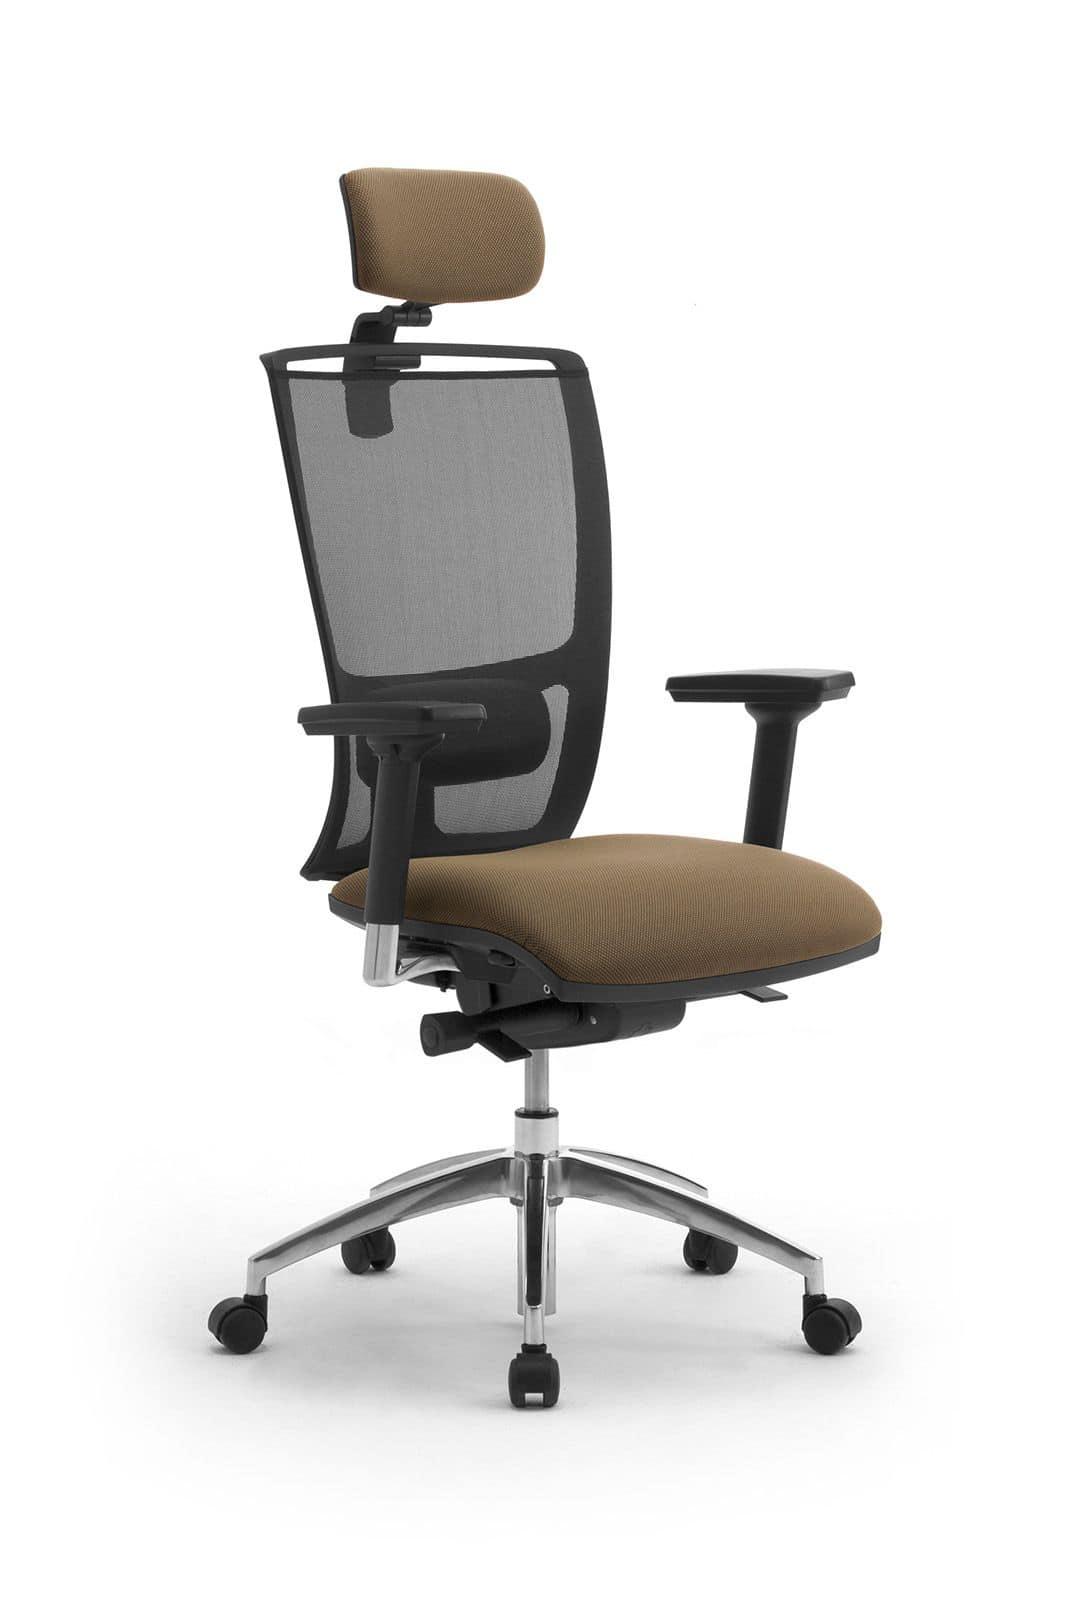 office chair with headrest, mesh backrest   idfdesign